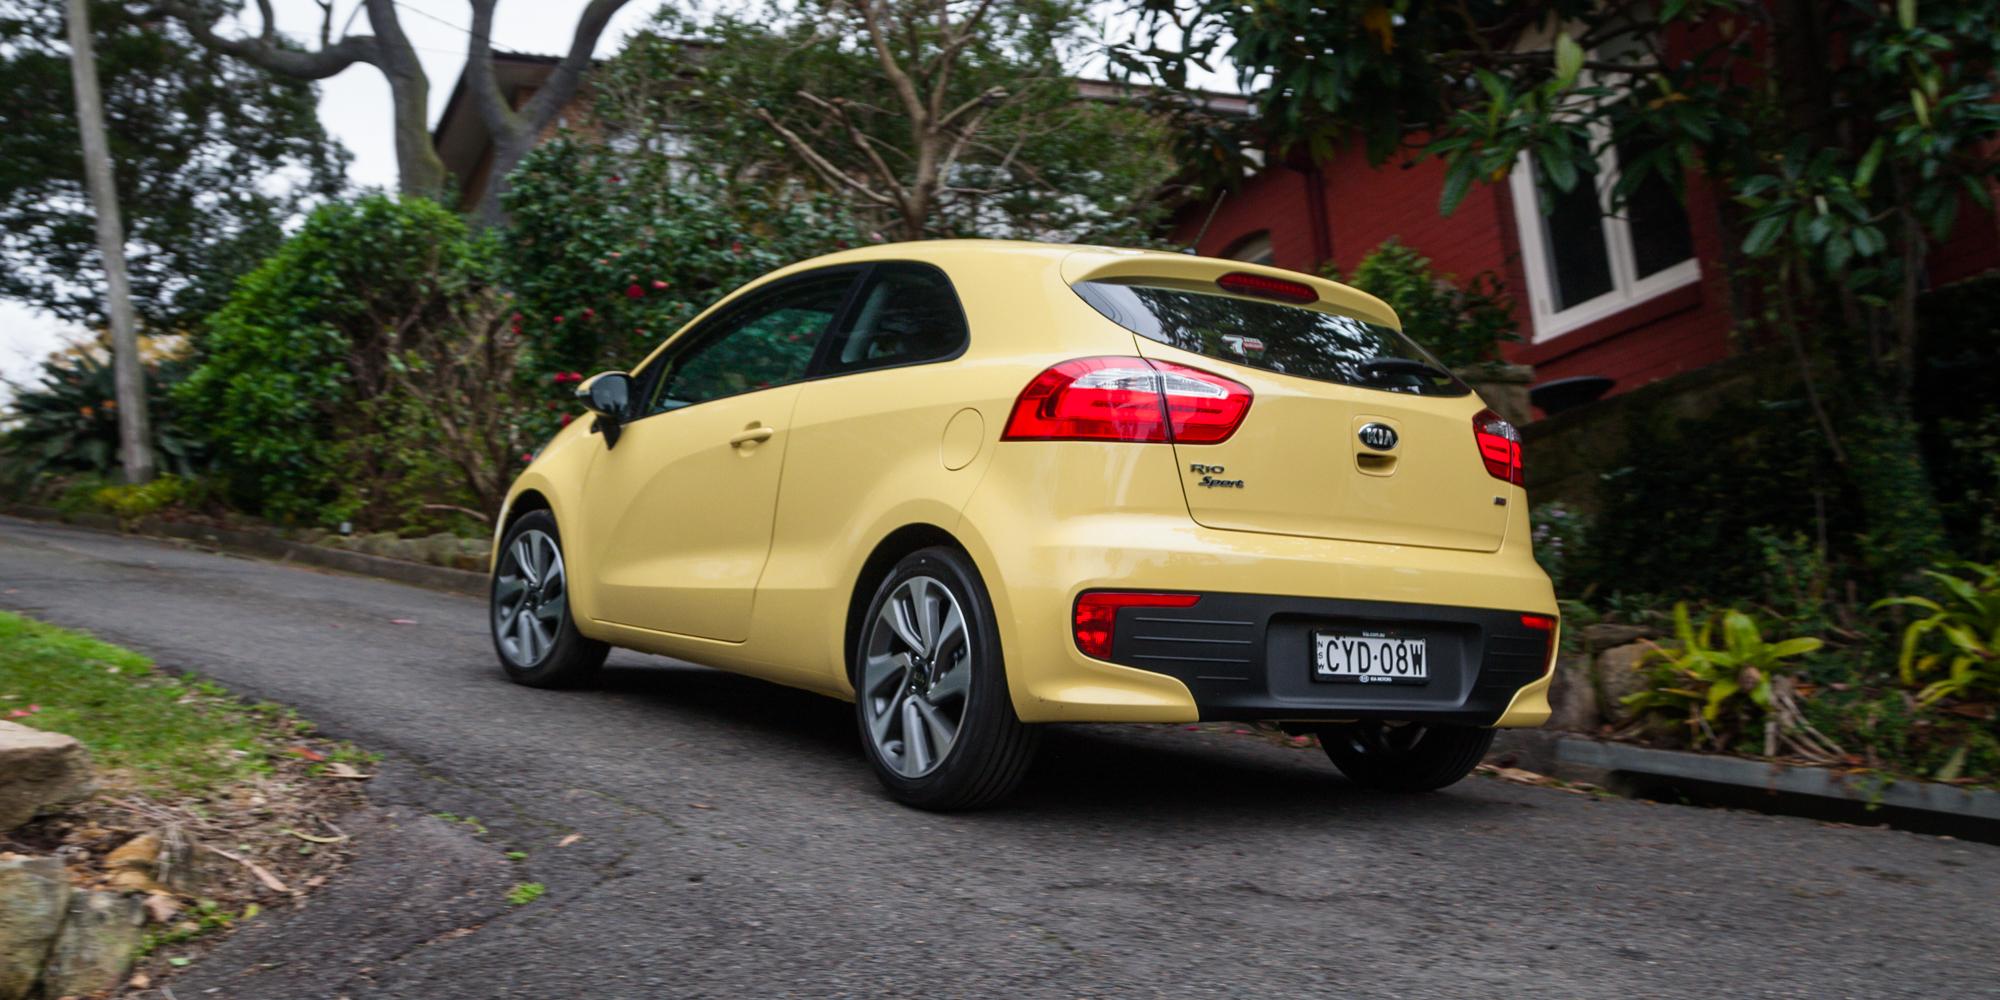 yellow car 2015 09 - photo #42